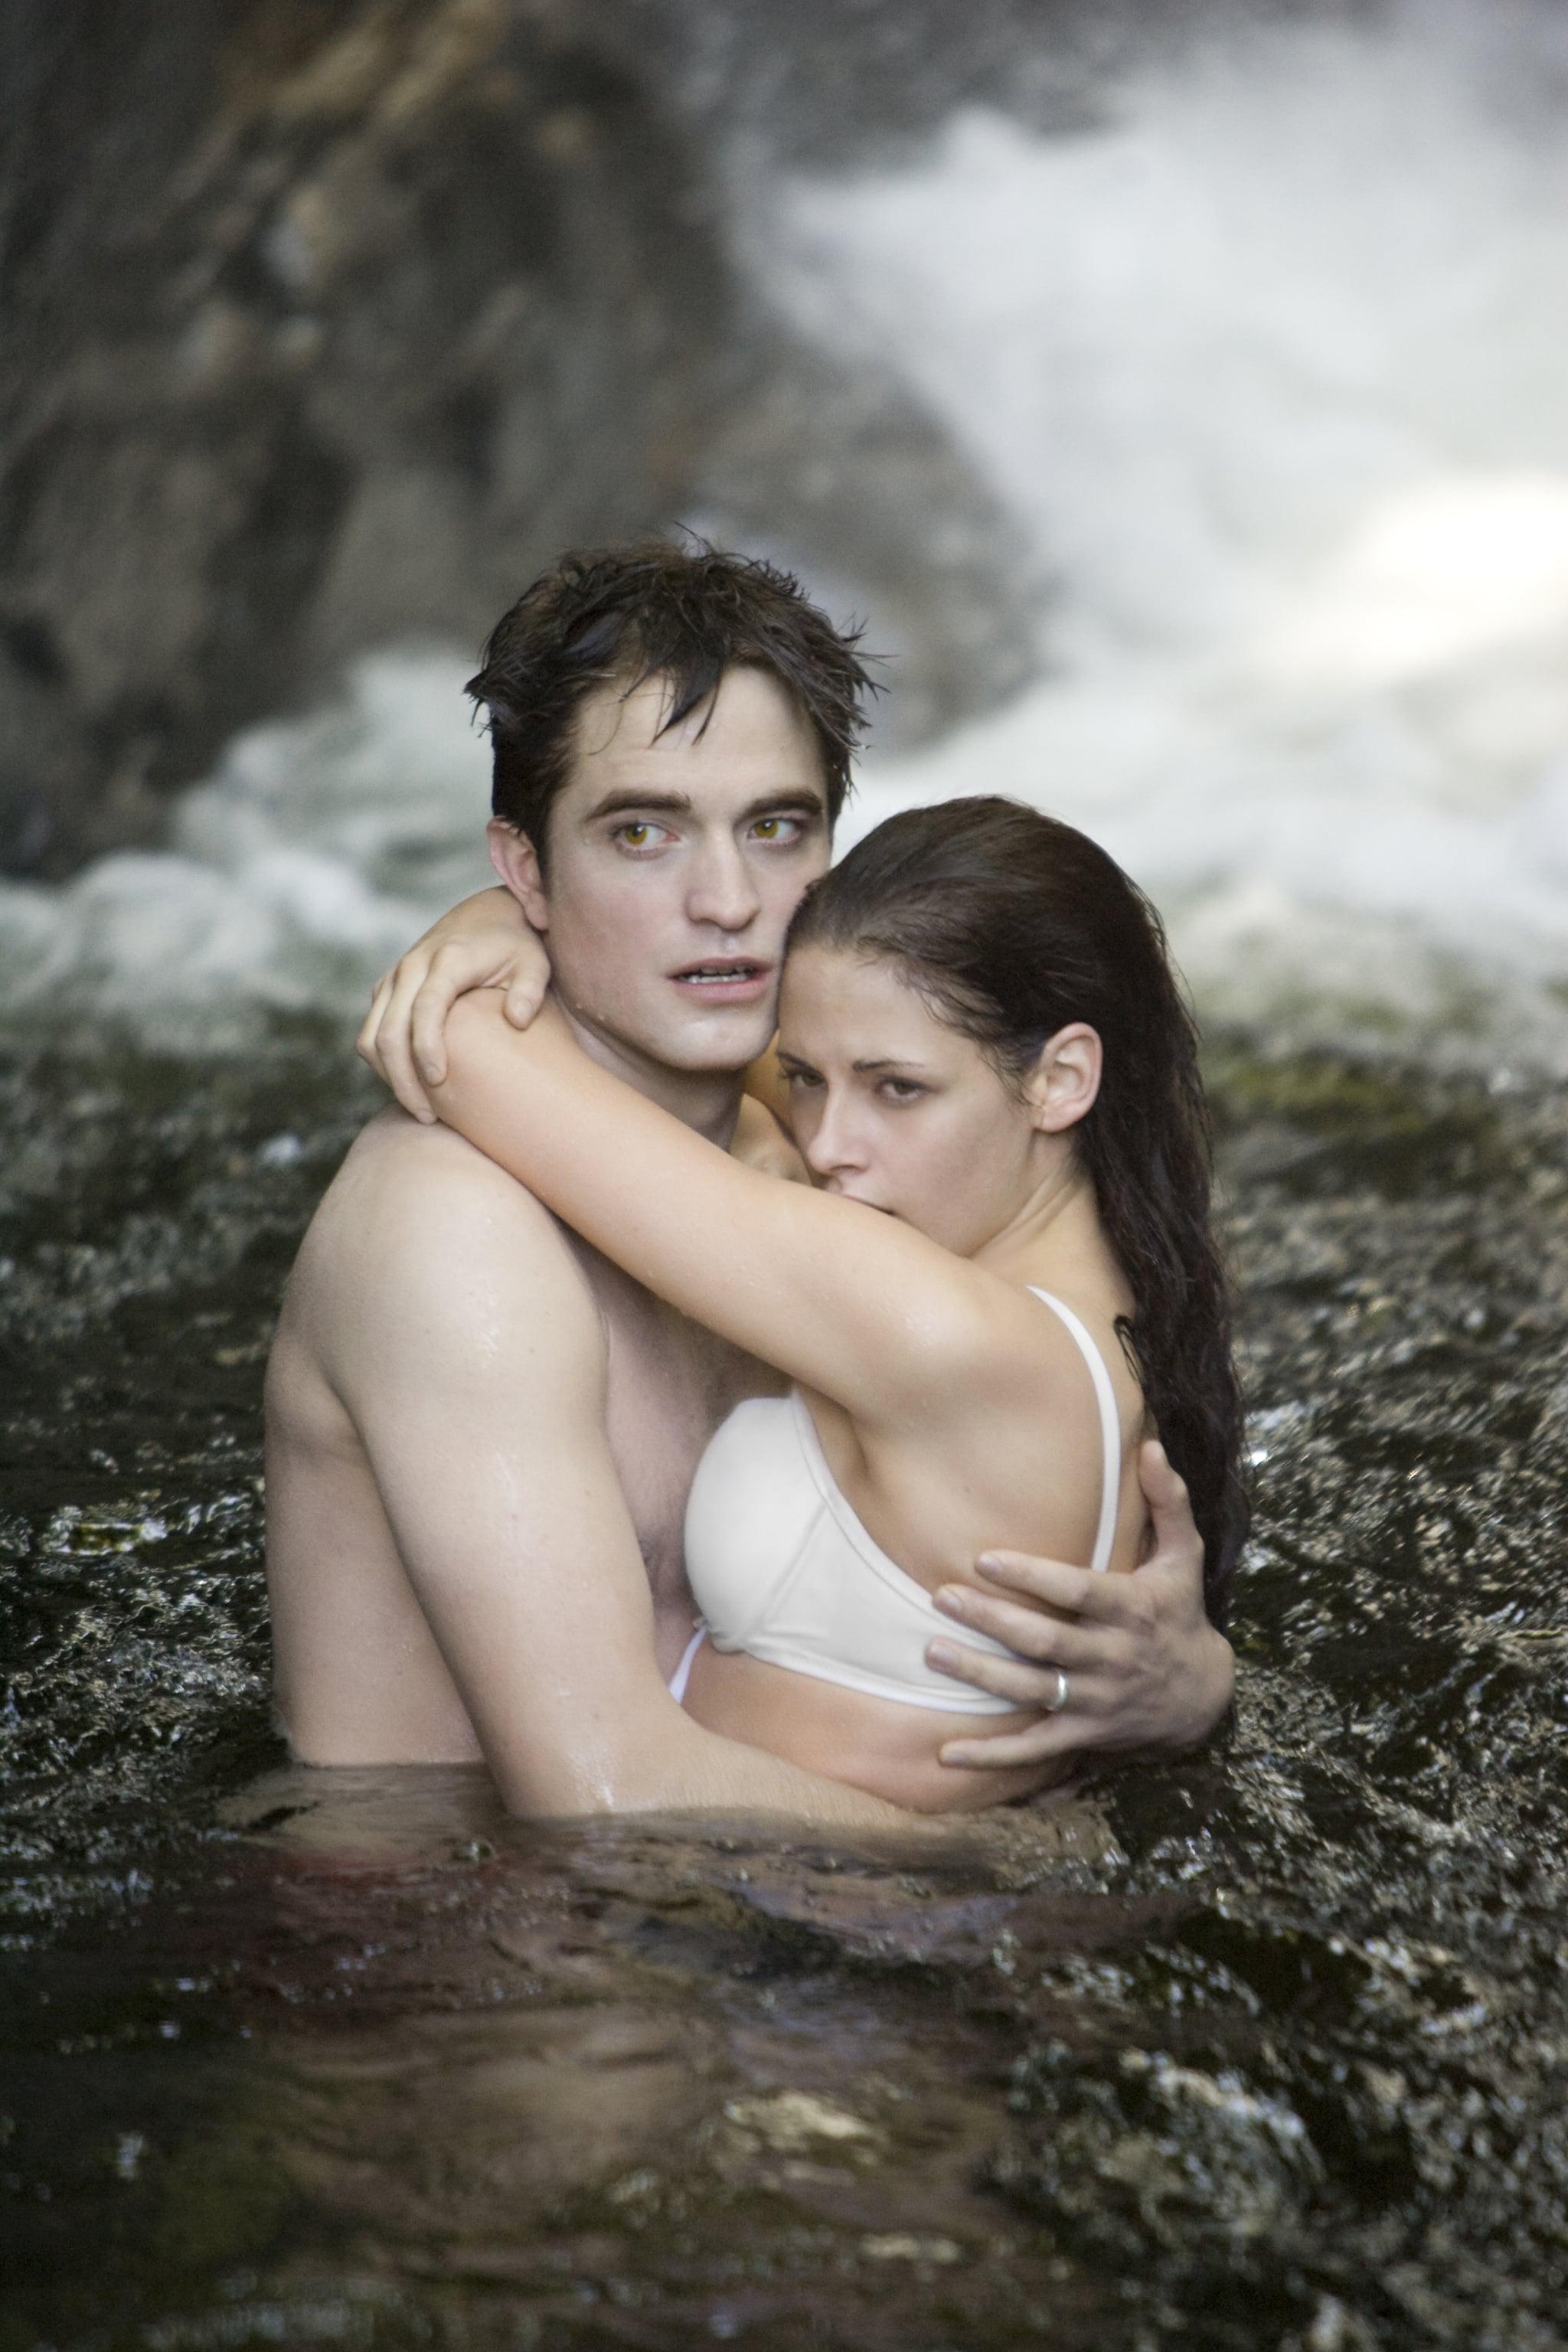 Kristen Stewart and Robert Pattinson play out Bella and Edward's famous honeymoon waterfall scene.